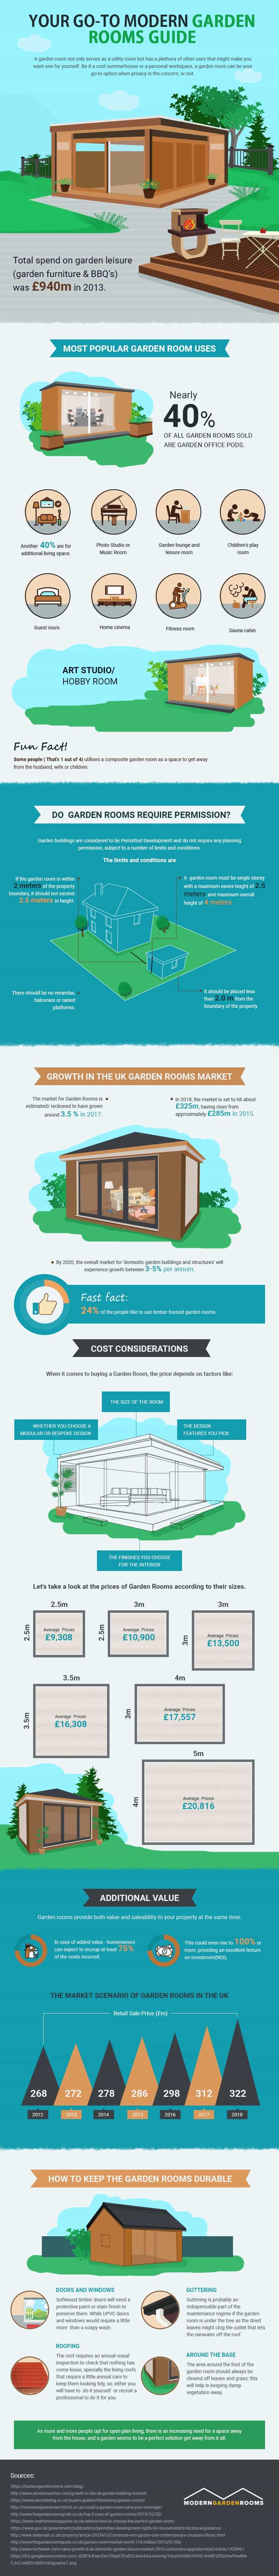 Modern-Garden-Rooms-Infographic